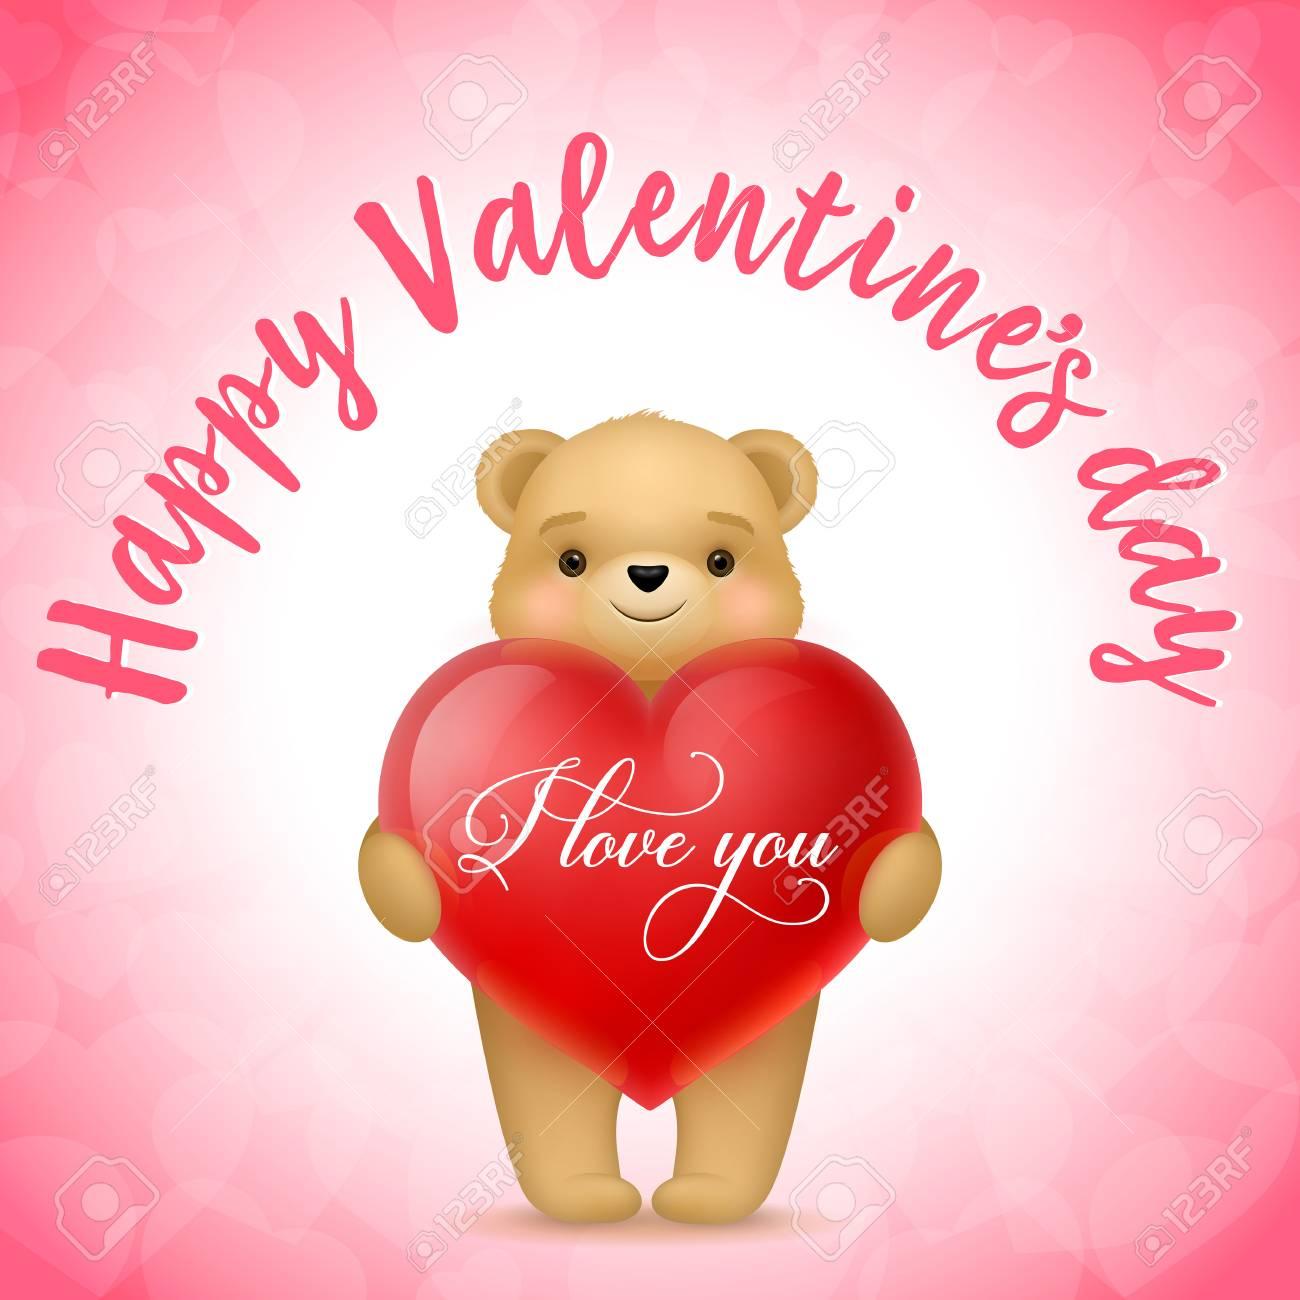 Happy valentines day i love you lettering saint valentines day happy valentines day i love you lettering saint valentines day greeting card with teddy bear altavistaventures Images